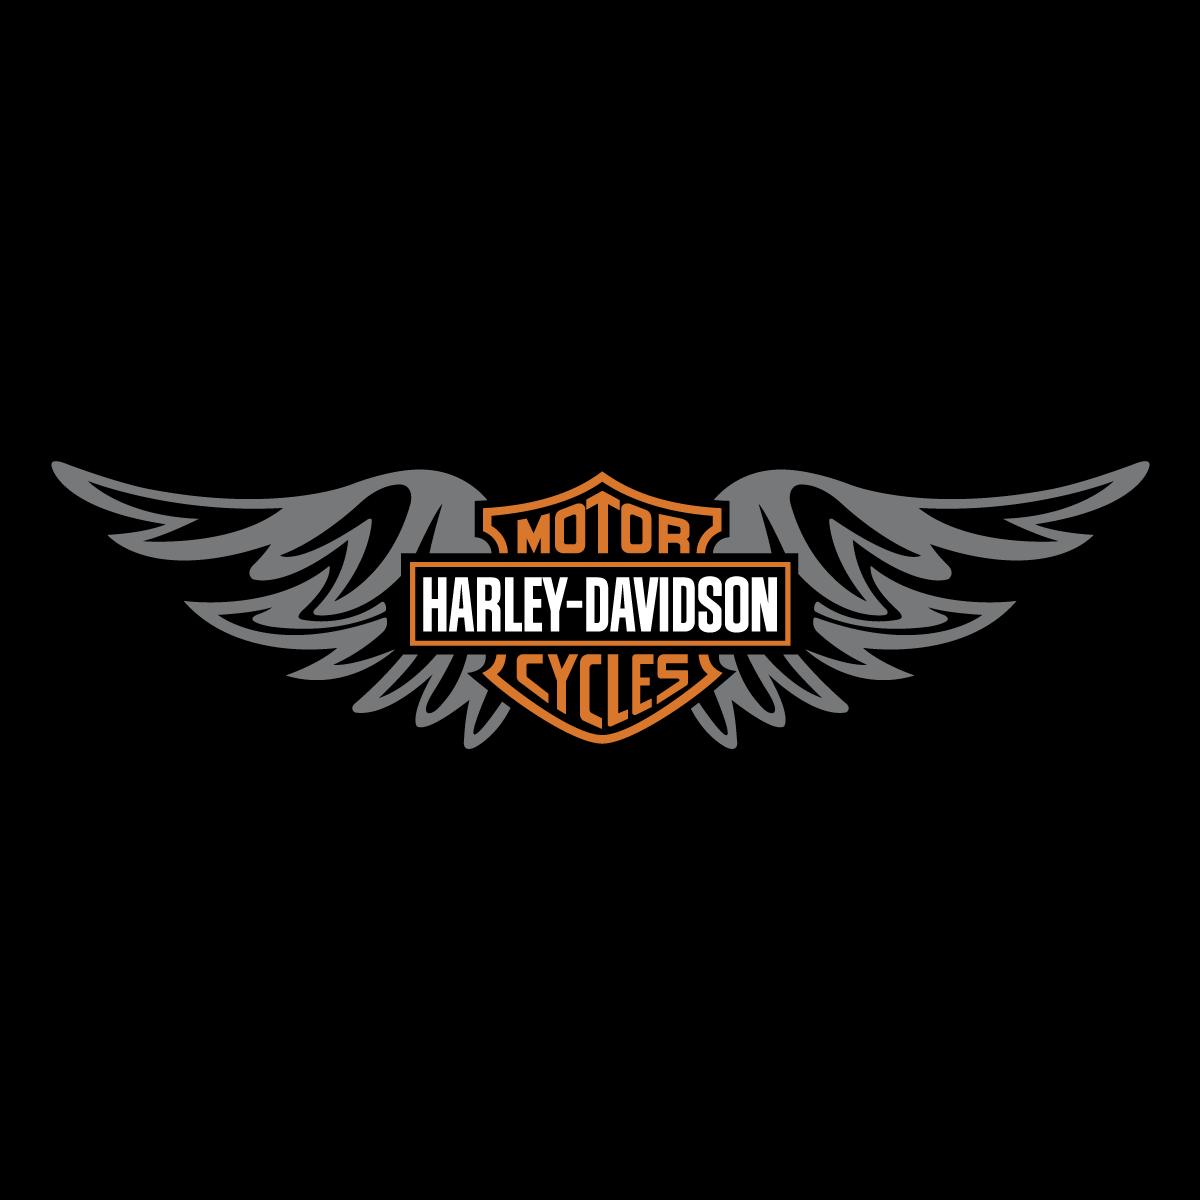 1200x1200 Harley Davidson Wings Logo Vector Decal Emblem Free Vector